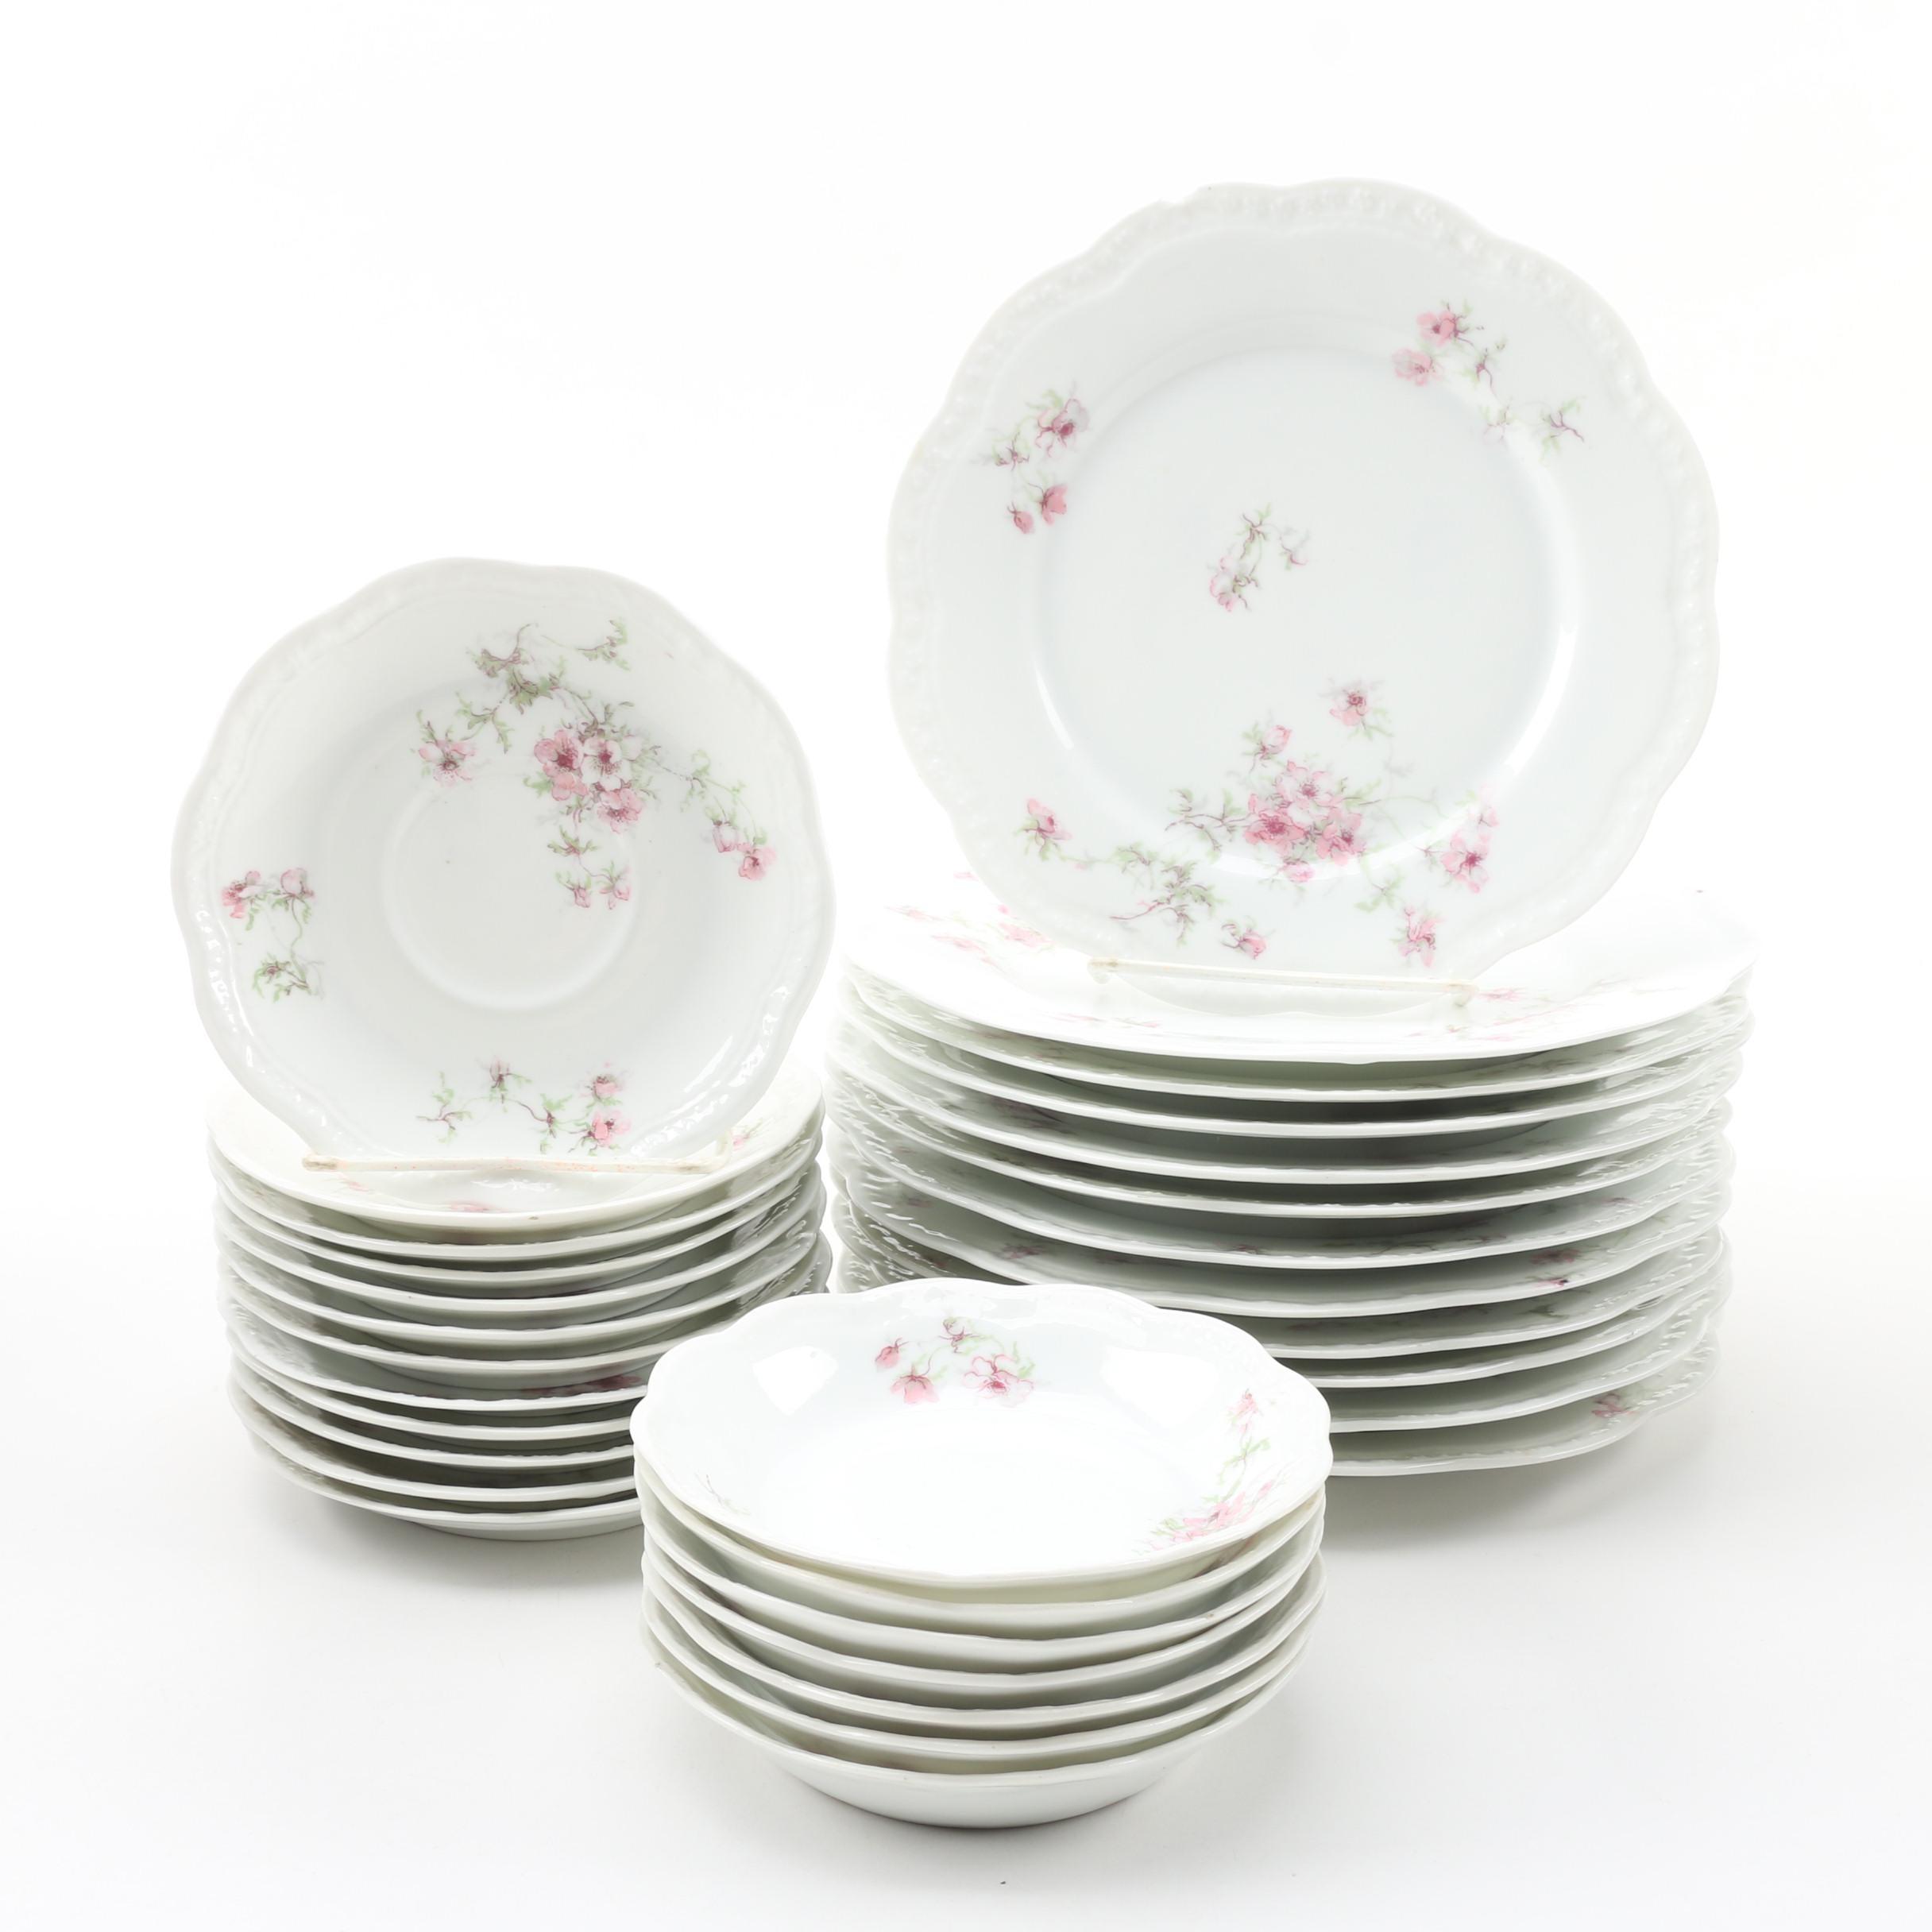 A. Lanternier Limoges Porcelain Dinnerware, circa 1891-1914